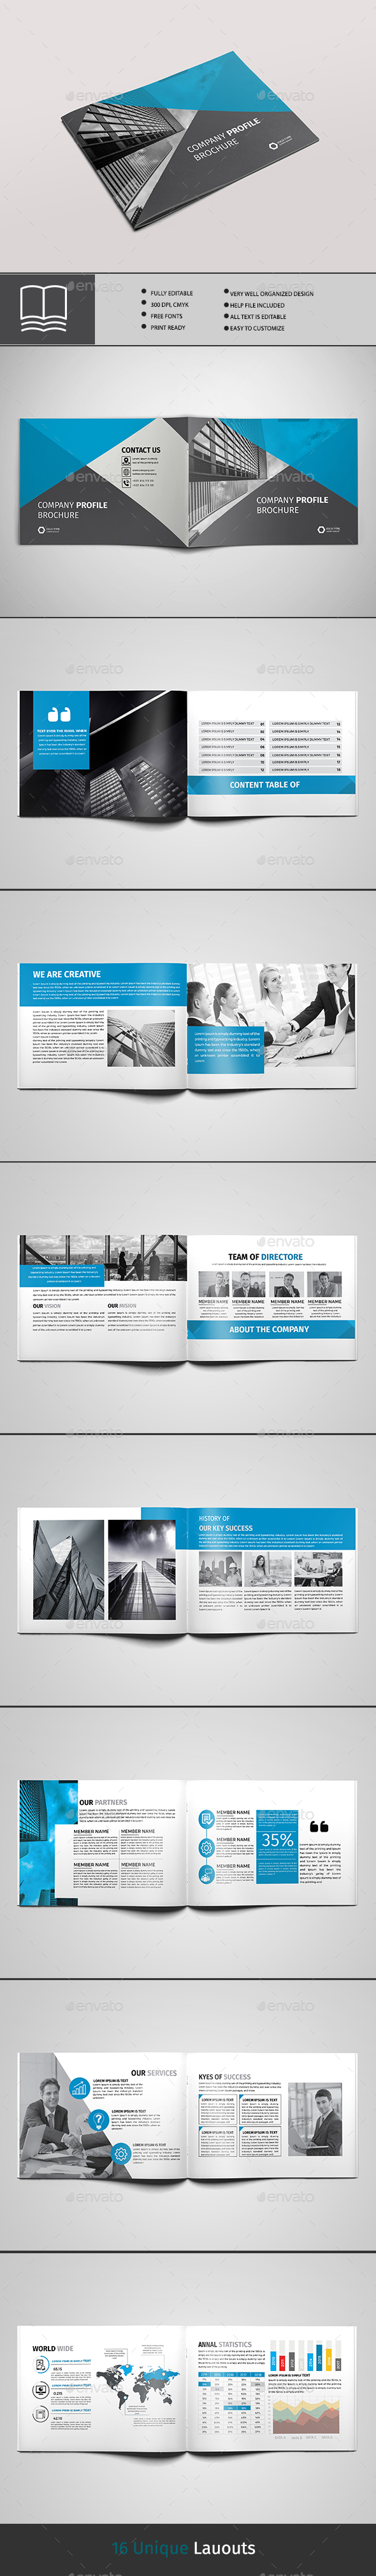 Company Profile 16 Page - Brochures Print Templates